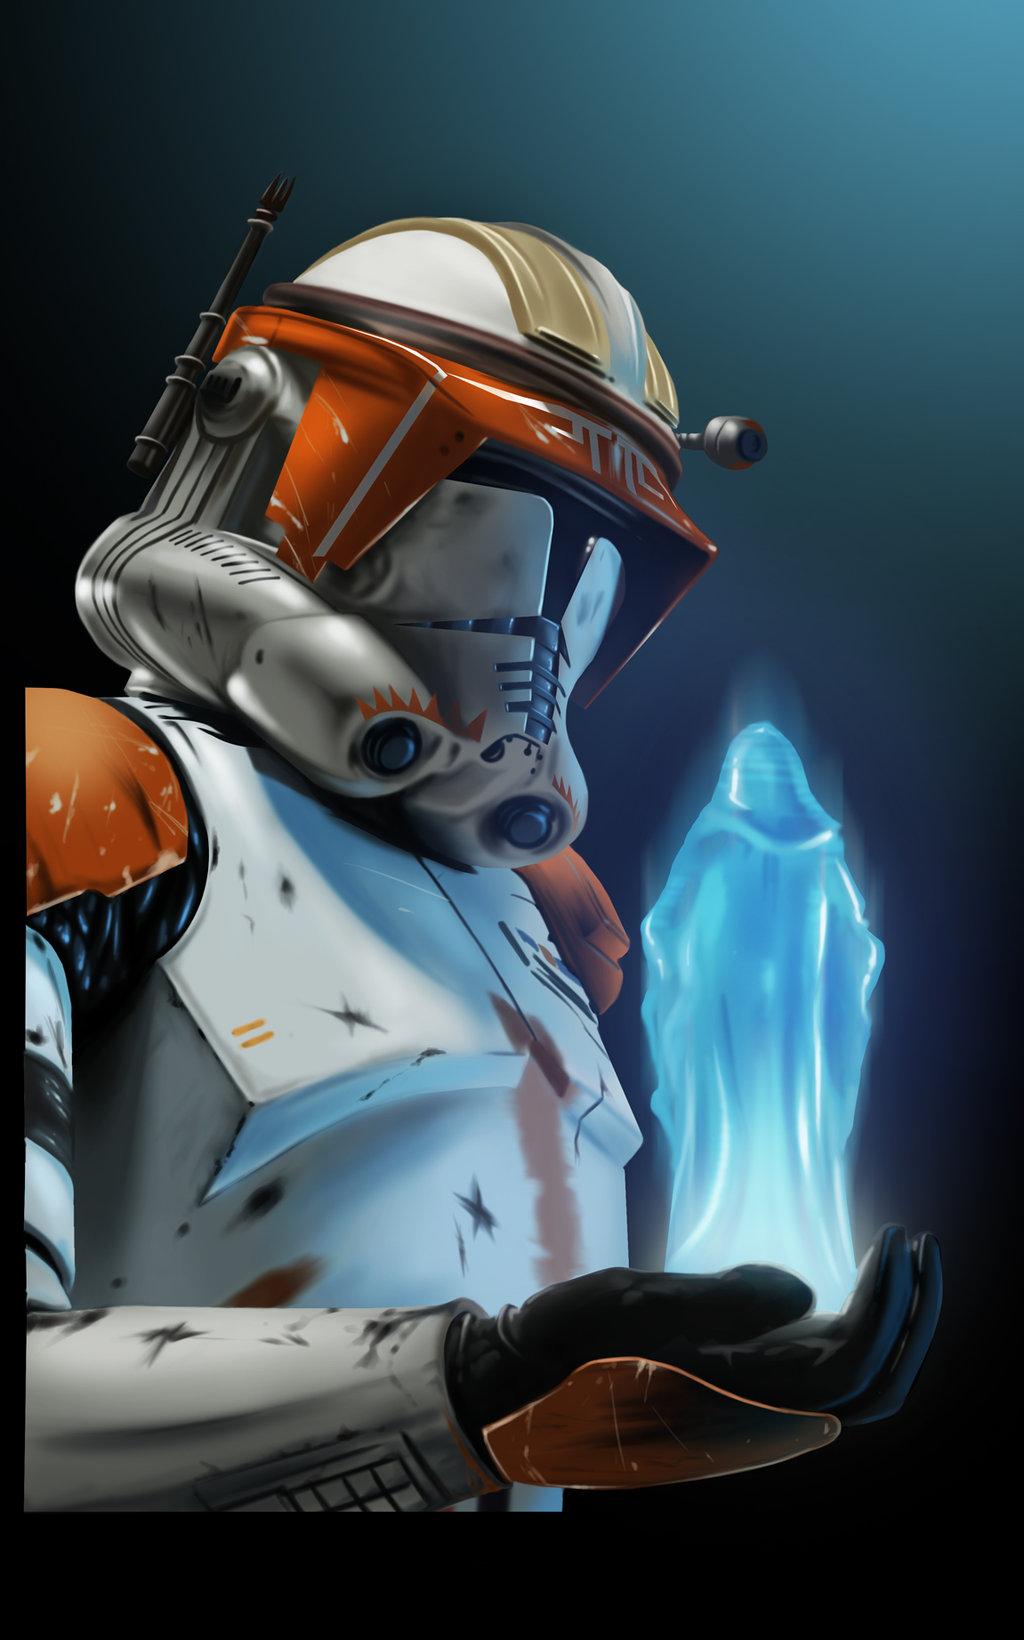 star wars by ashasylum1 60 Impressive Star Wars Illustrations and Artworks